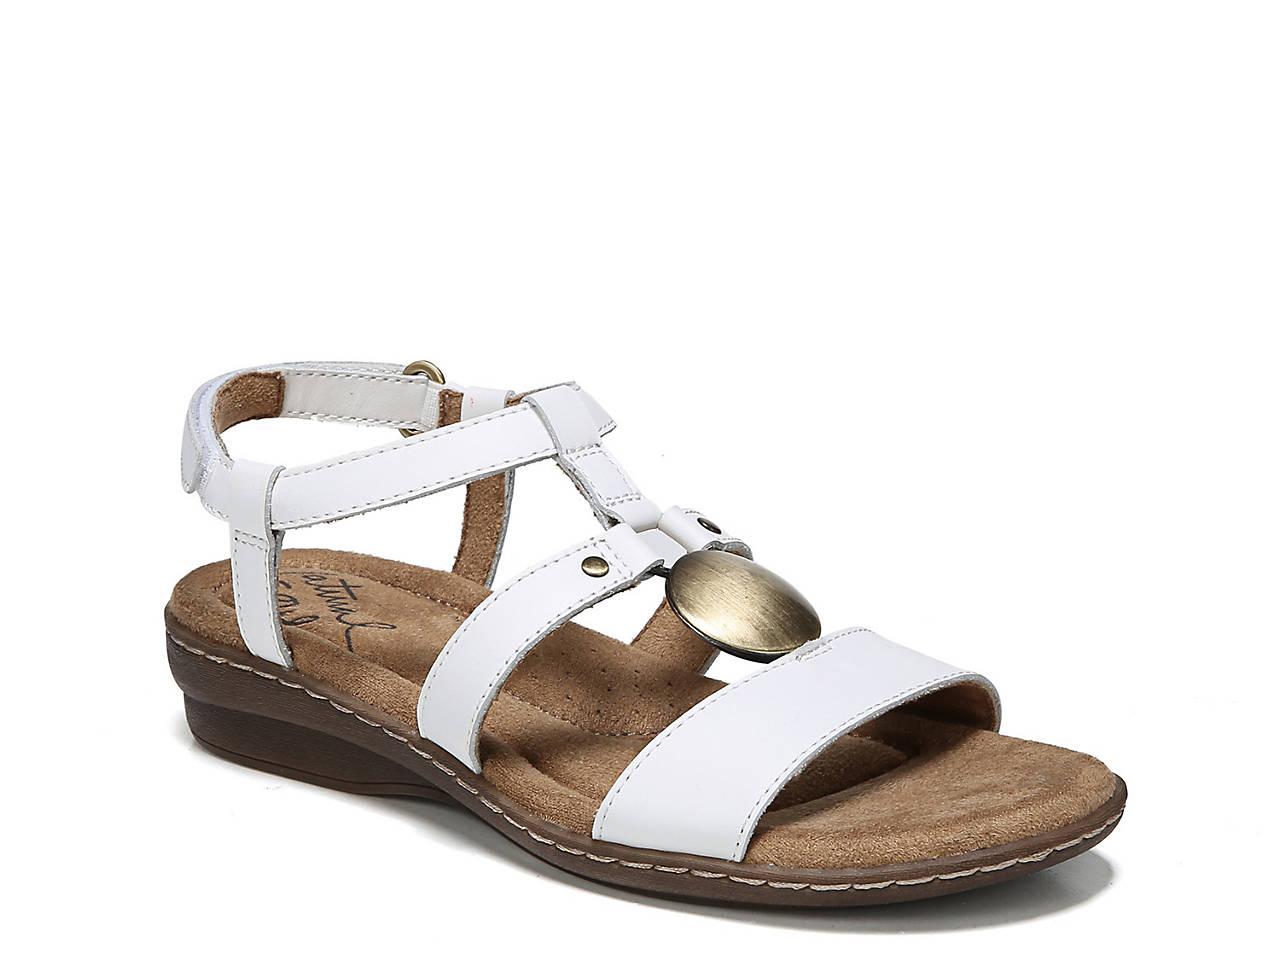 377ea3ca5918 Natural Soul Brenda Sandal Women s Shoes